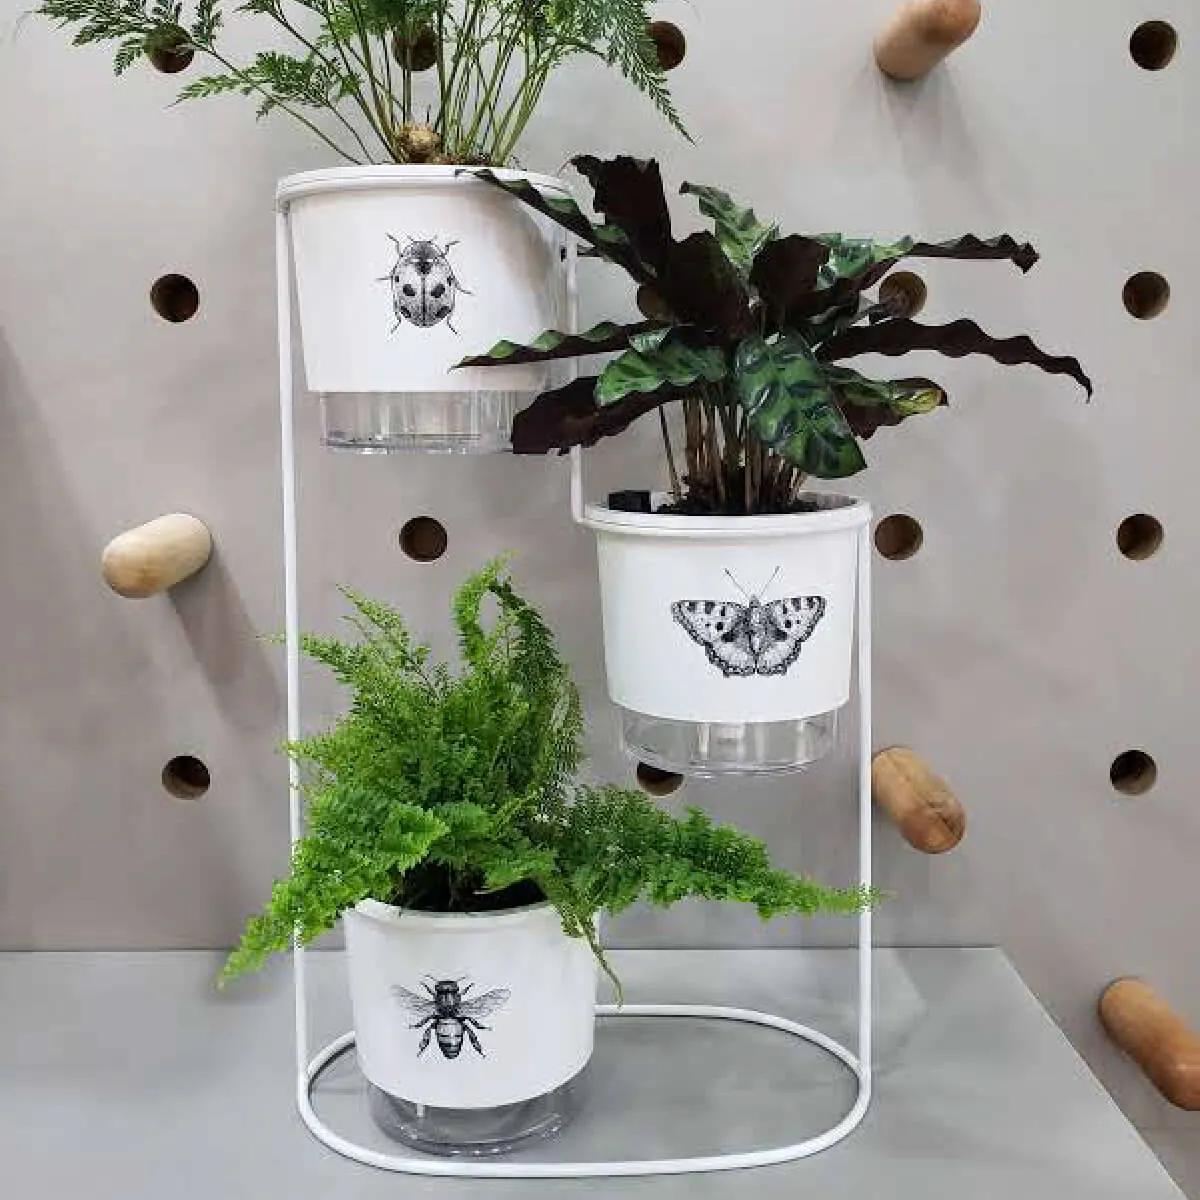 03 Vasos Autoirrigáveis Jardim de insetos em Aramado cascata 02 anéis  - Vasos Raiz Loja Oficial